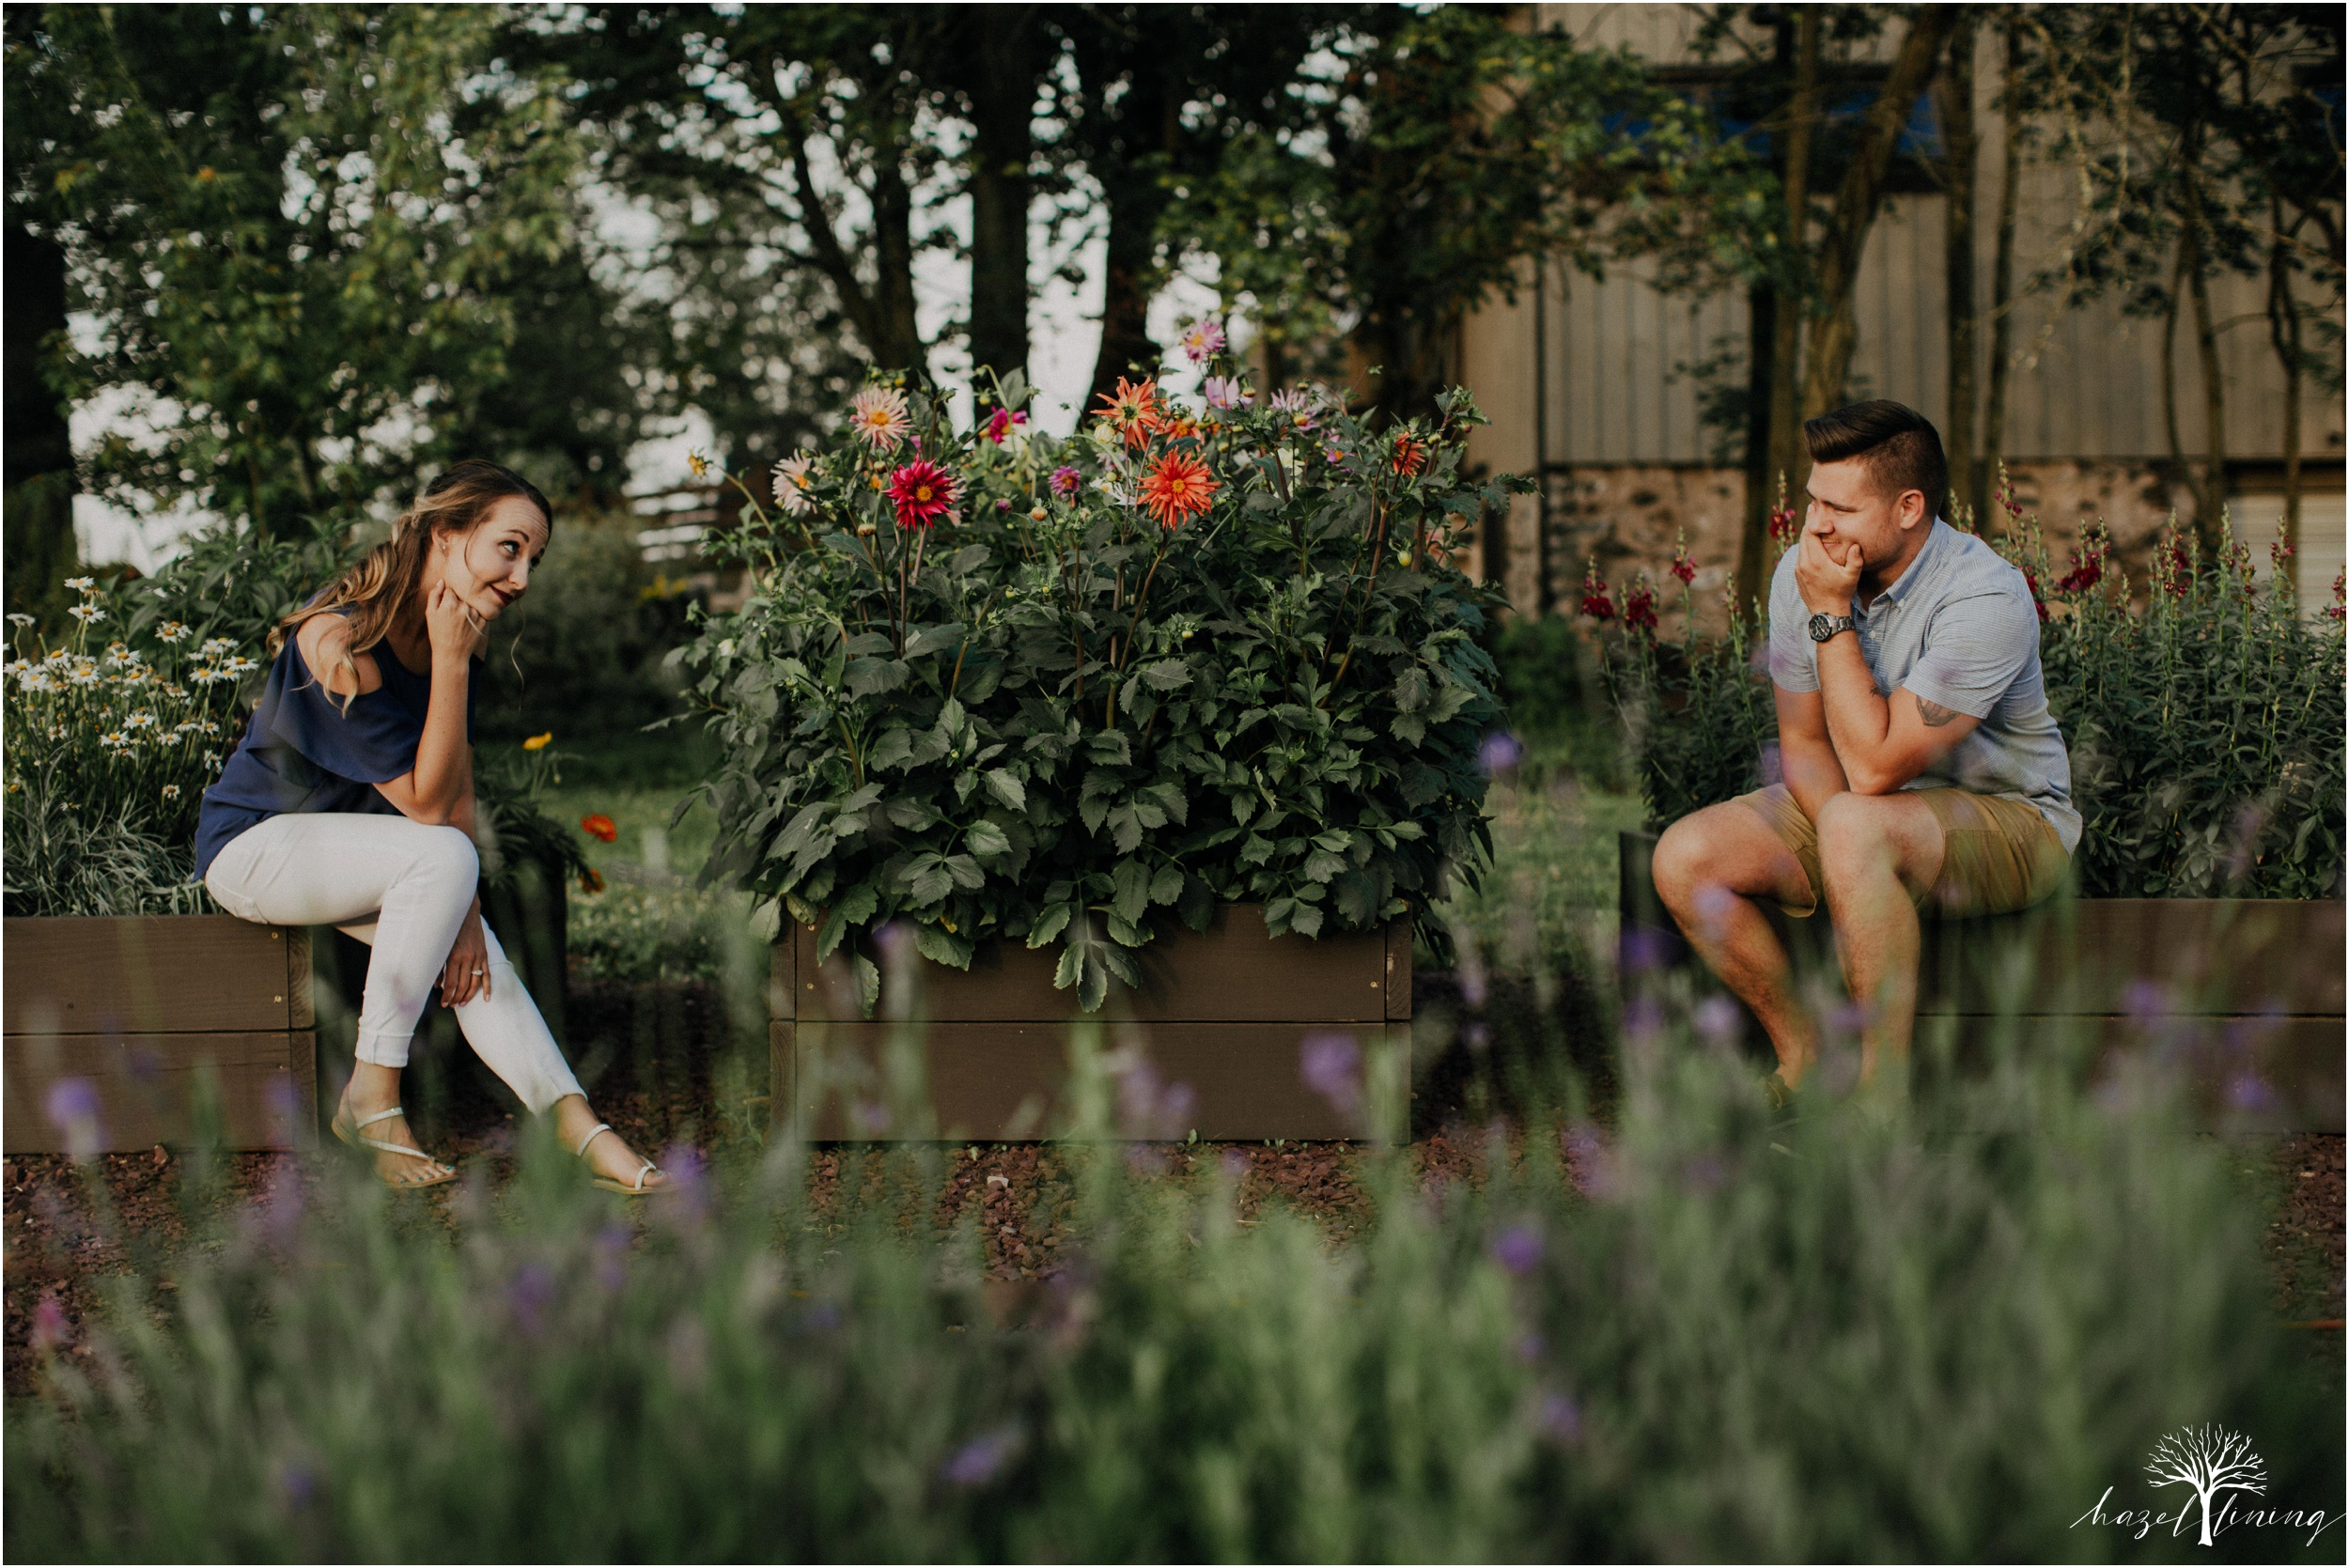 rachel-warner-chris-niedrist-the-farm-bakery-and-events-quakertown-pa-summer-engagement-hazel-lining-photography-destination-elopement-wedding-engagement-photography_0058.jpg